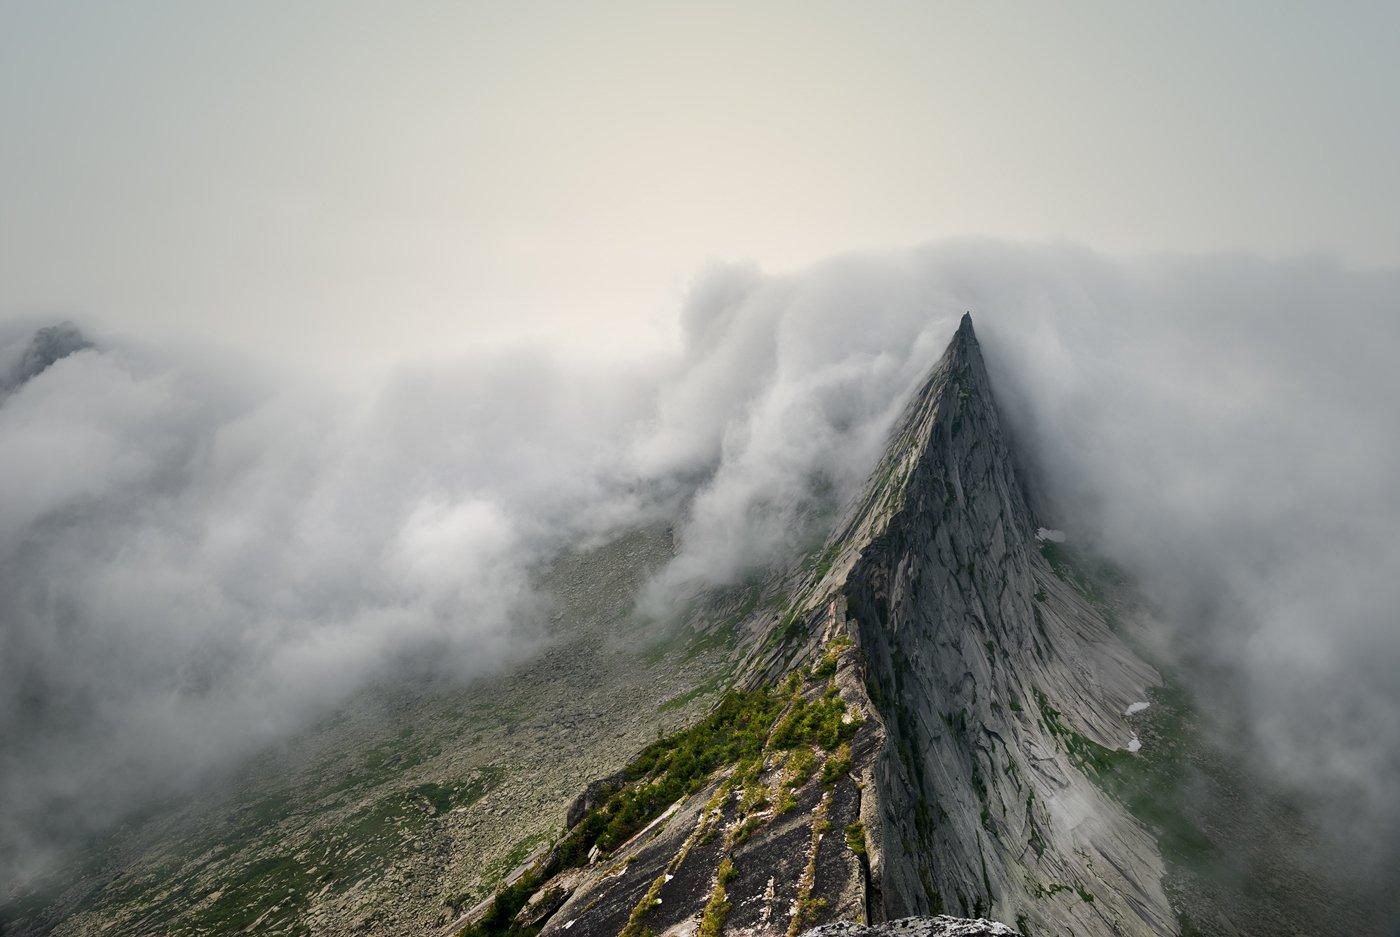 peak, nature, landscape, rock, mount, mountain, range, ergaki, high, природа, пейзаж, красивая, spectacular, big, high, большой, высокий, горы, скалы, вершина, пик, камни, туман, fog, mist, ergaki, sayan, travel, krasnoyarski krai, облака, густой, thick, Дмитрий Антипов